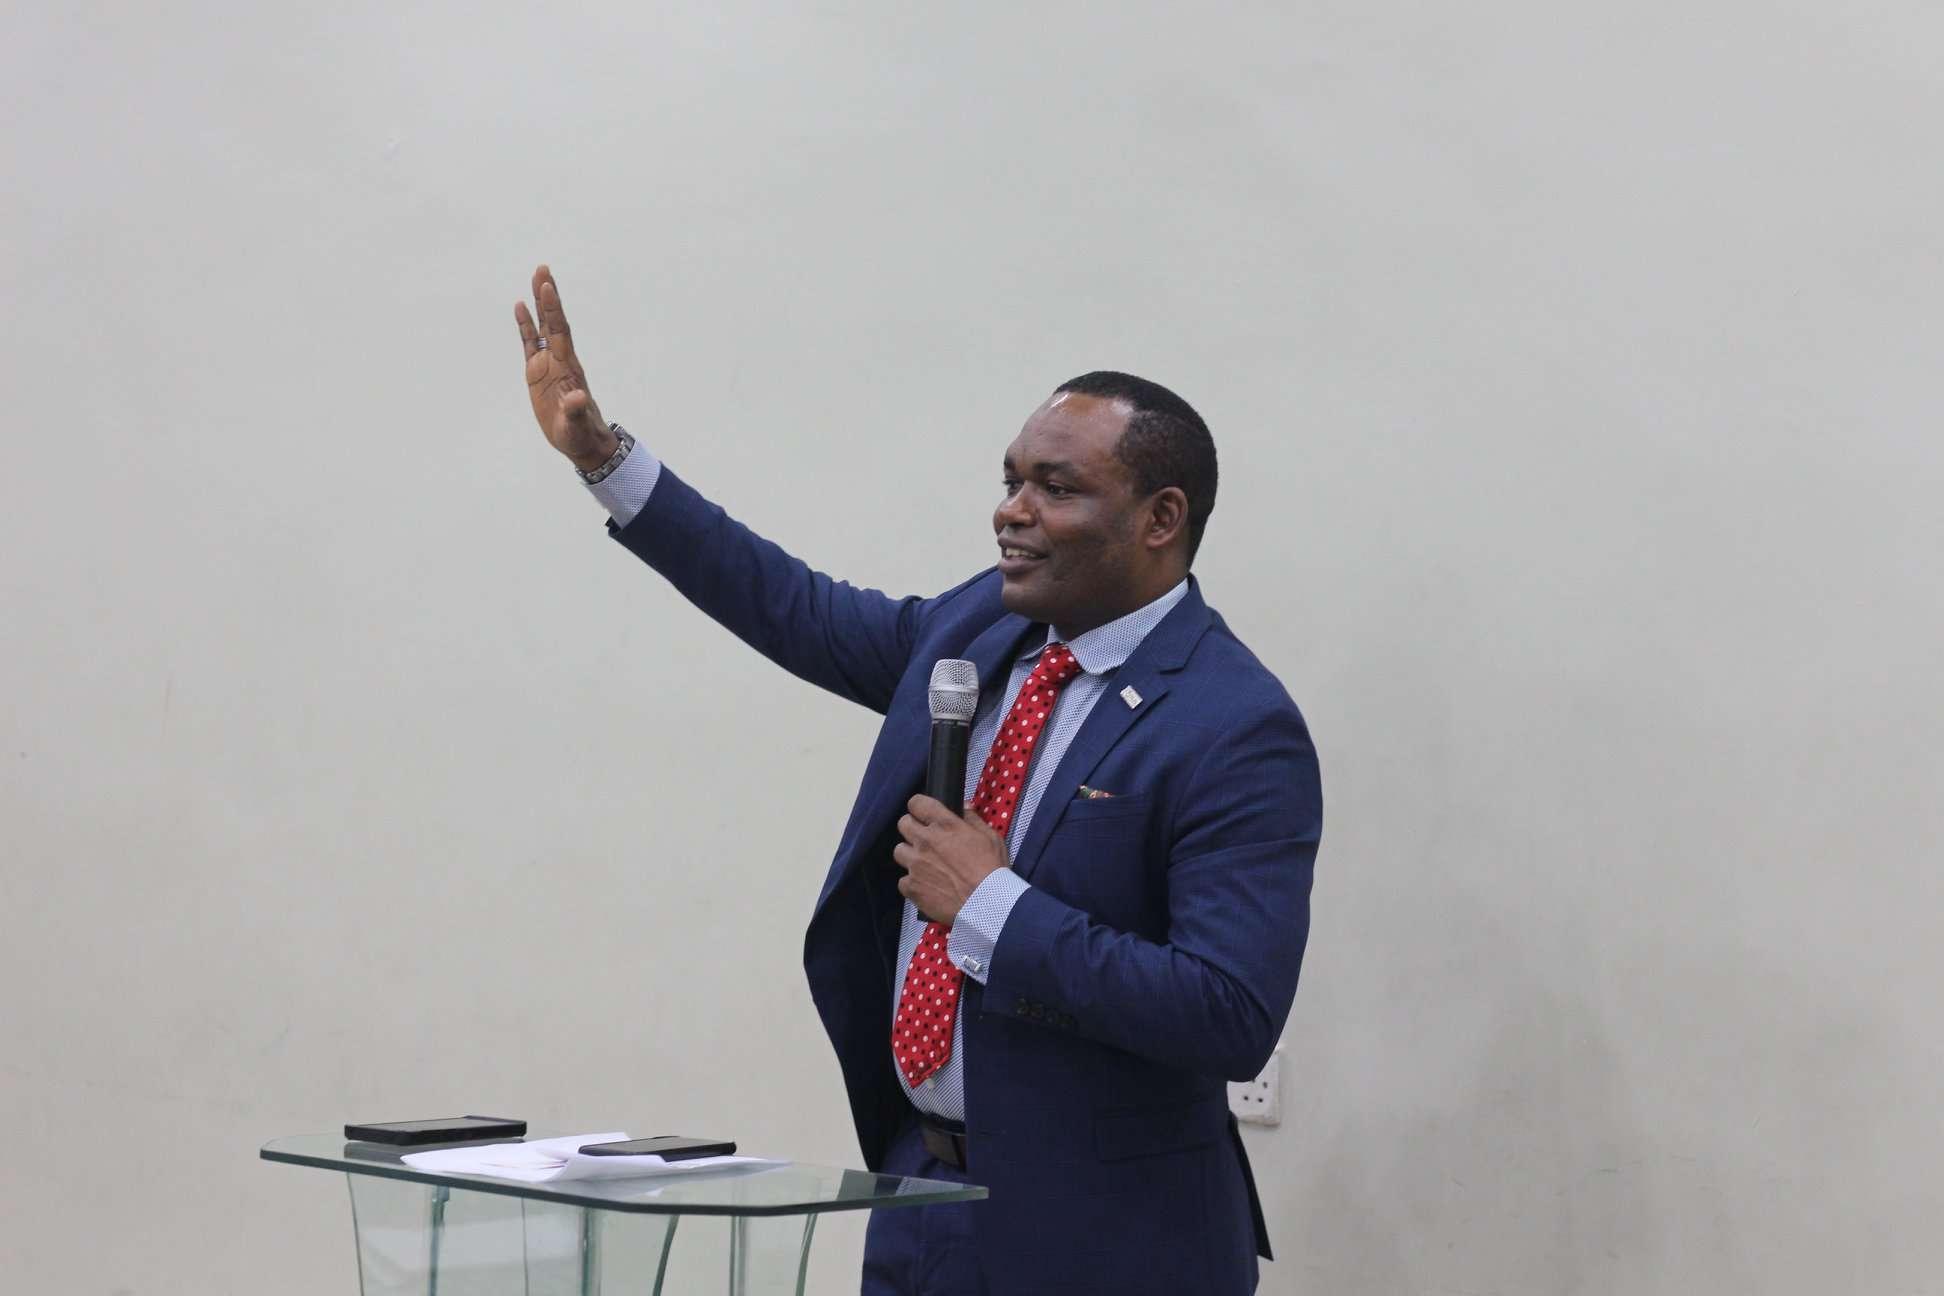 Patrick Uduma, Stand Out